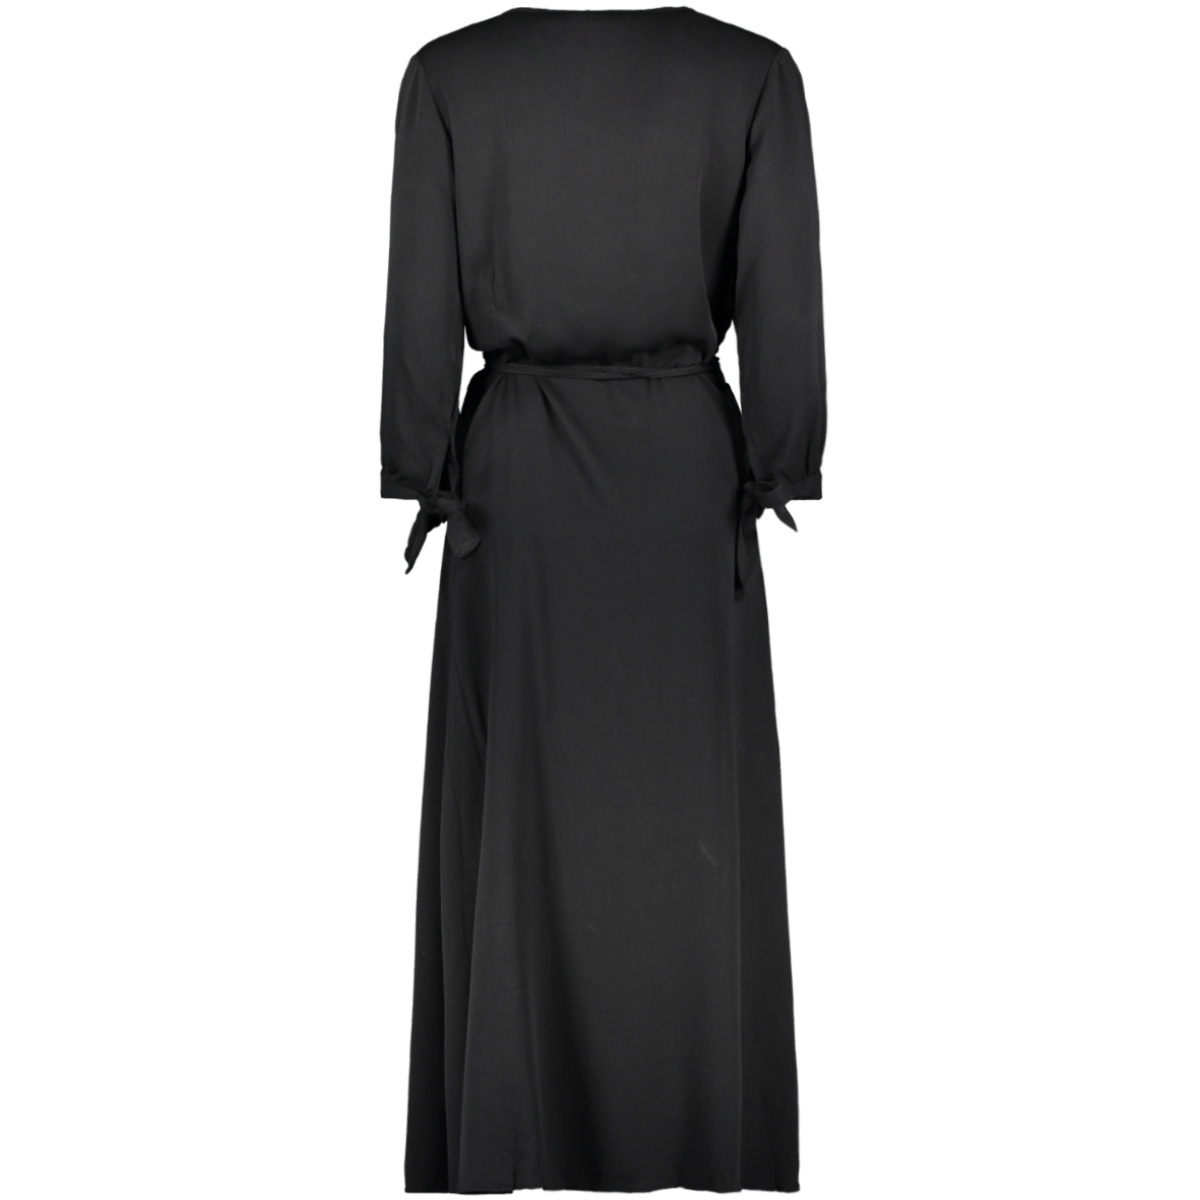 wrapp dress 97851 geisha jurk black